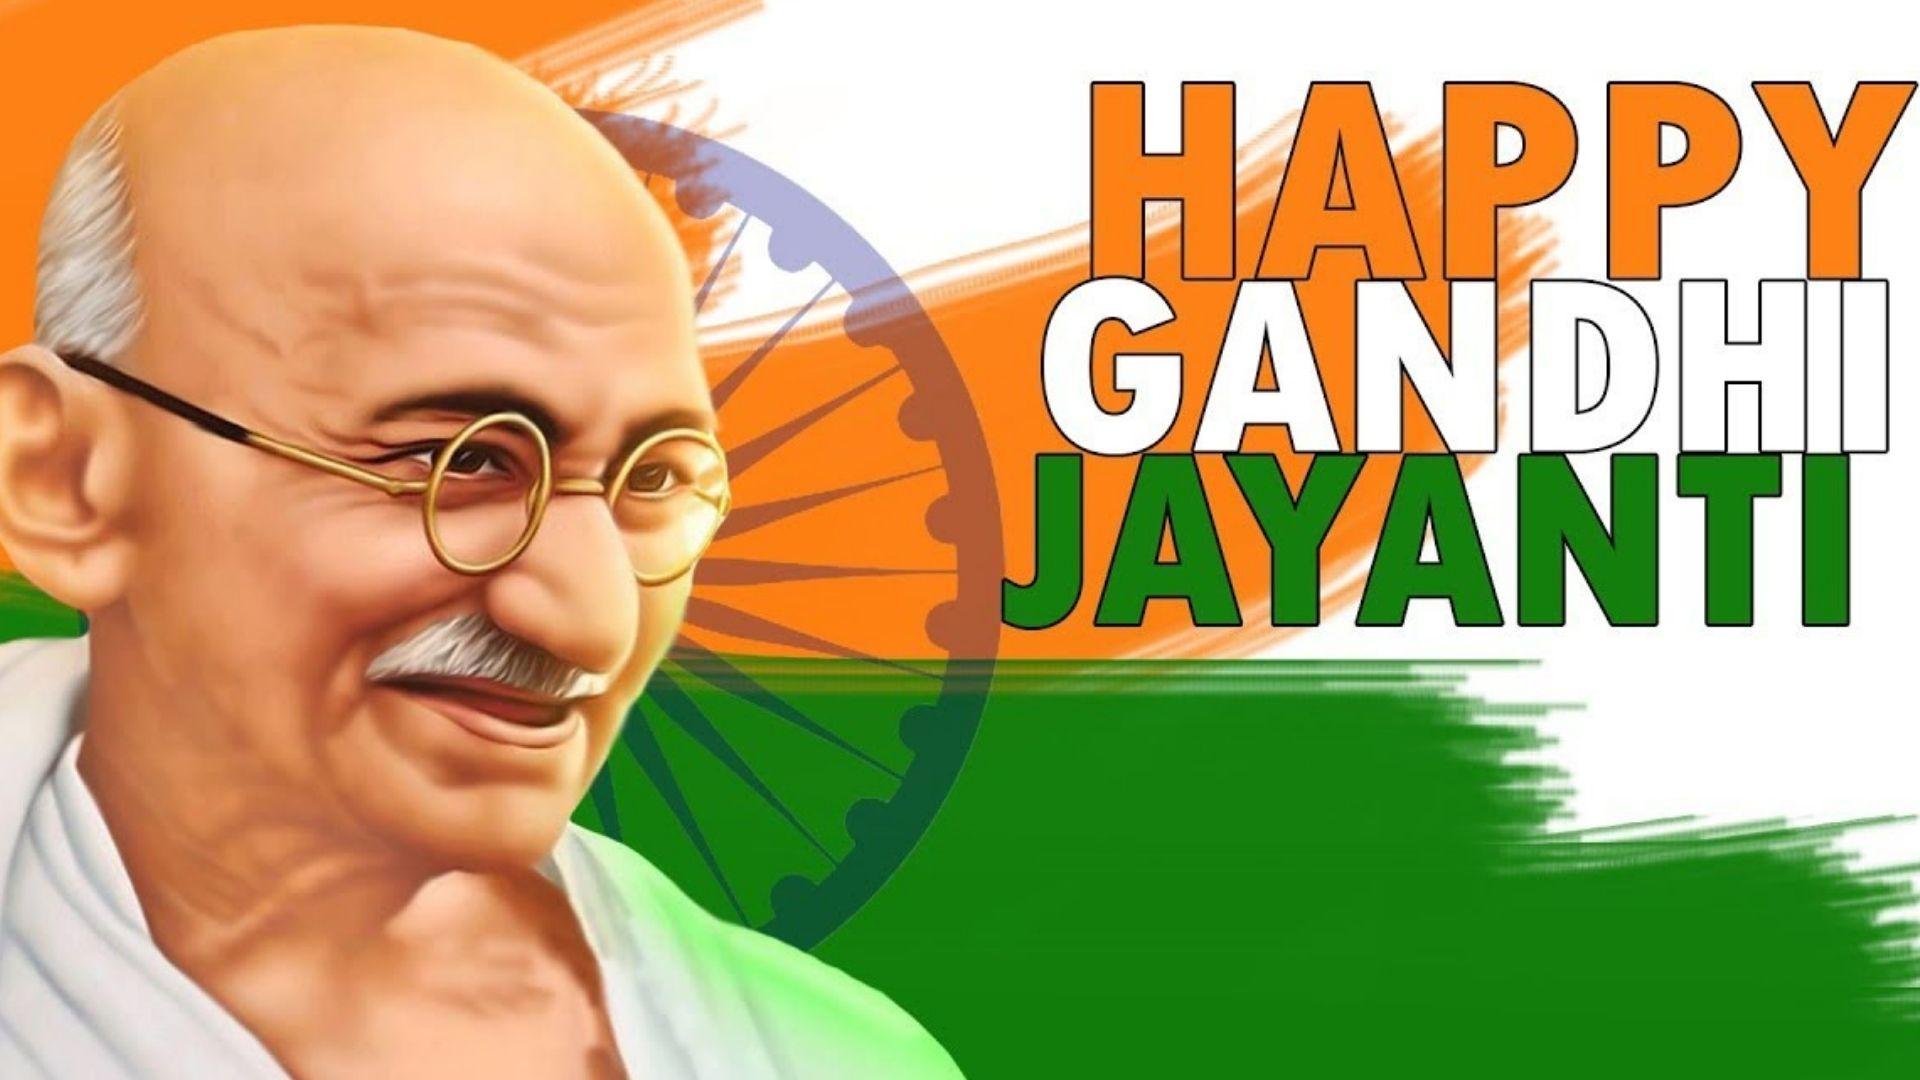 Gandhi Jayanti 2021: Katrina Kaif, Anushka Sharma, Taapsee Pannu And Sanjay Dutt Among Others Pay Tribute To Father Of The Nation